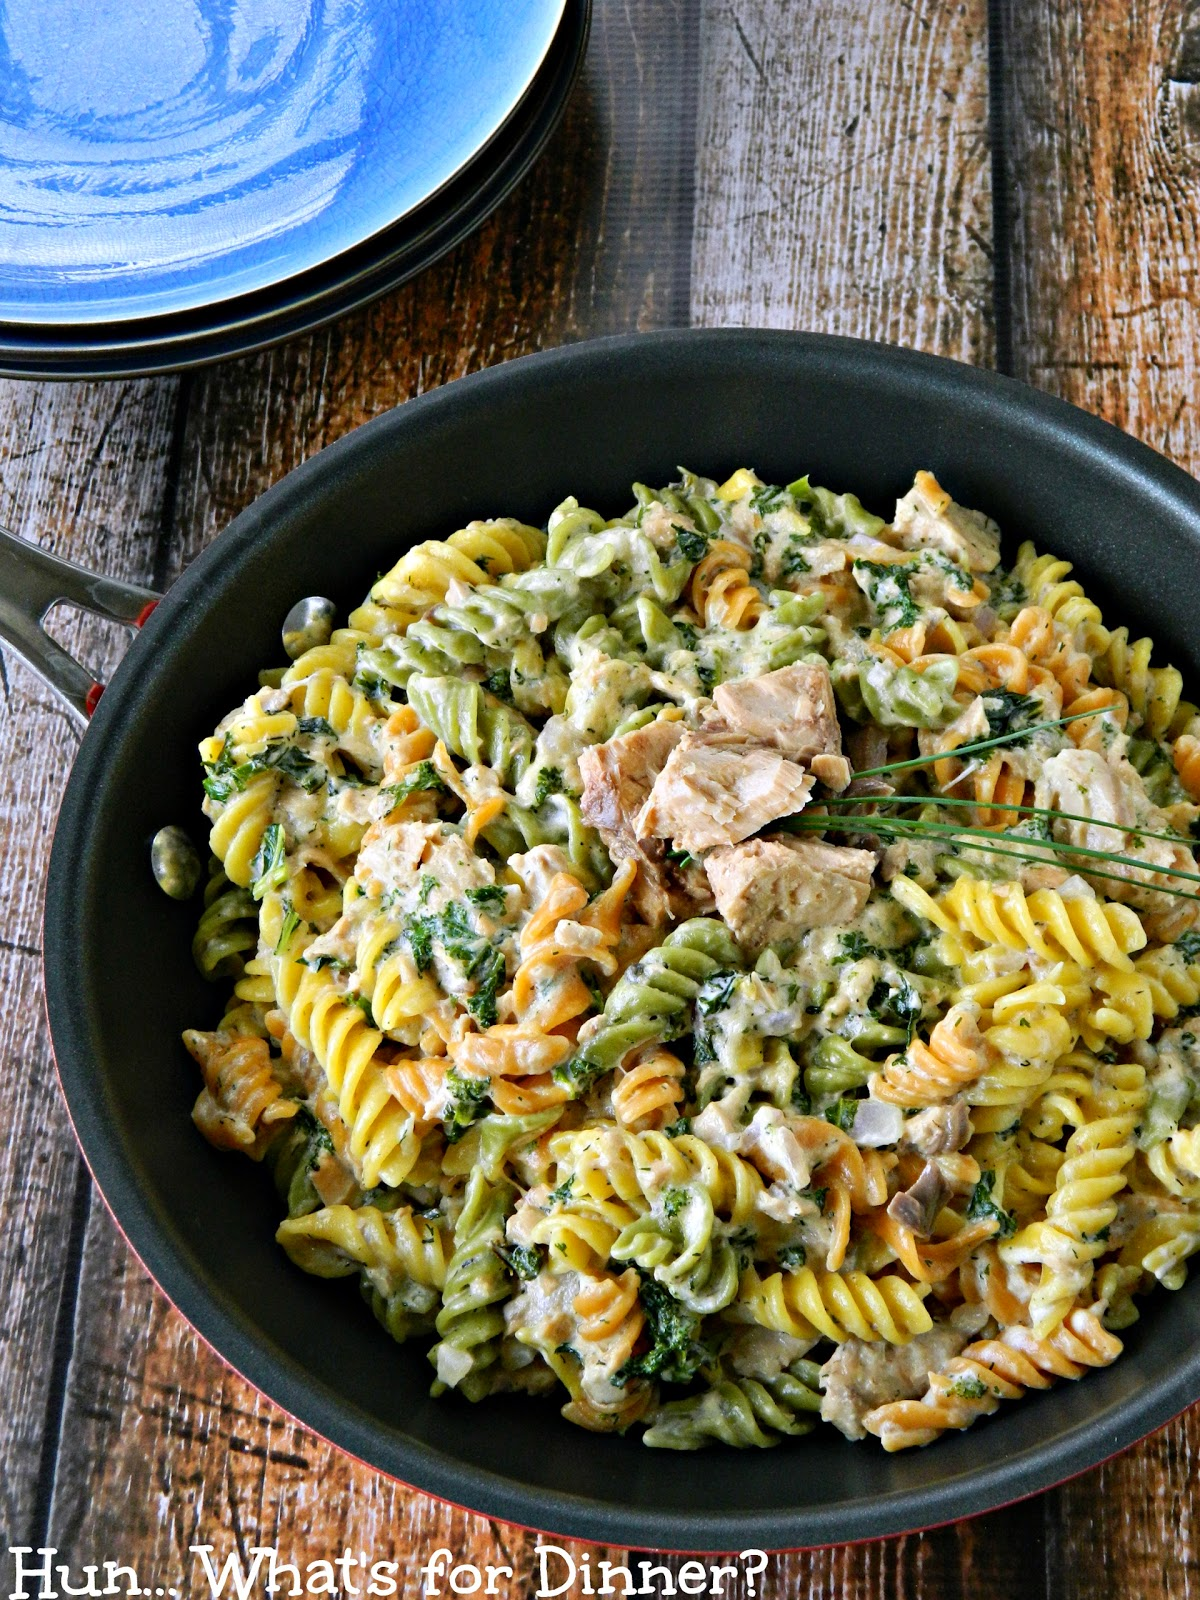 Hun... What's for Dinner?- Salmon Stroganoff Pasta